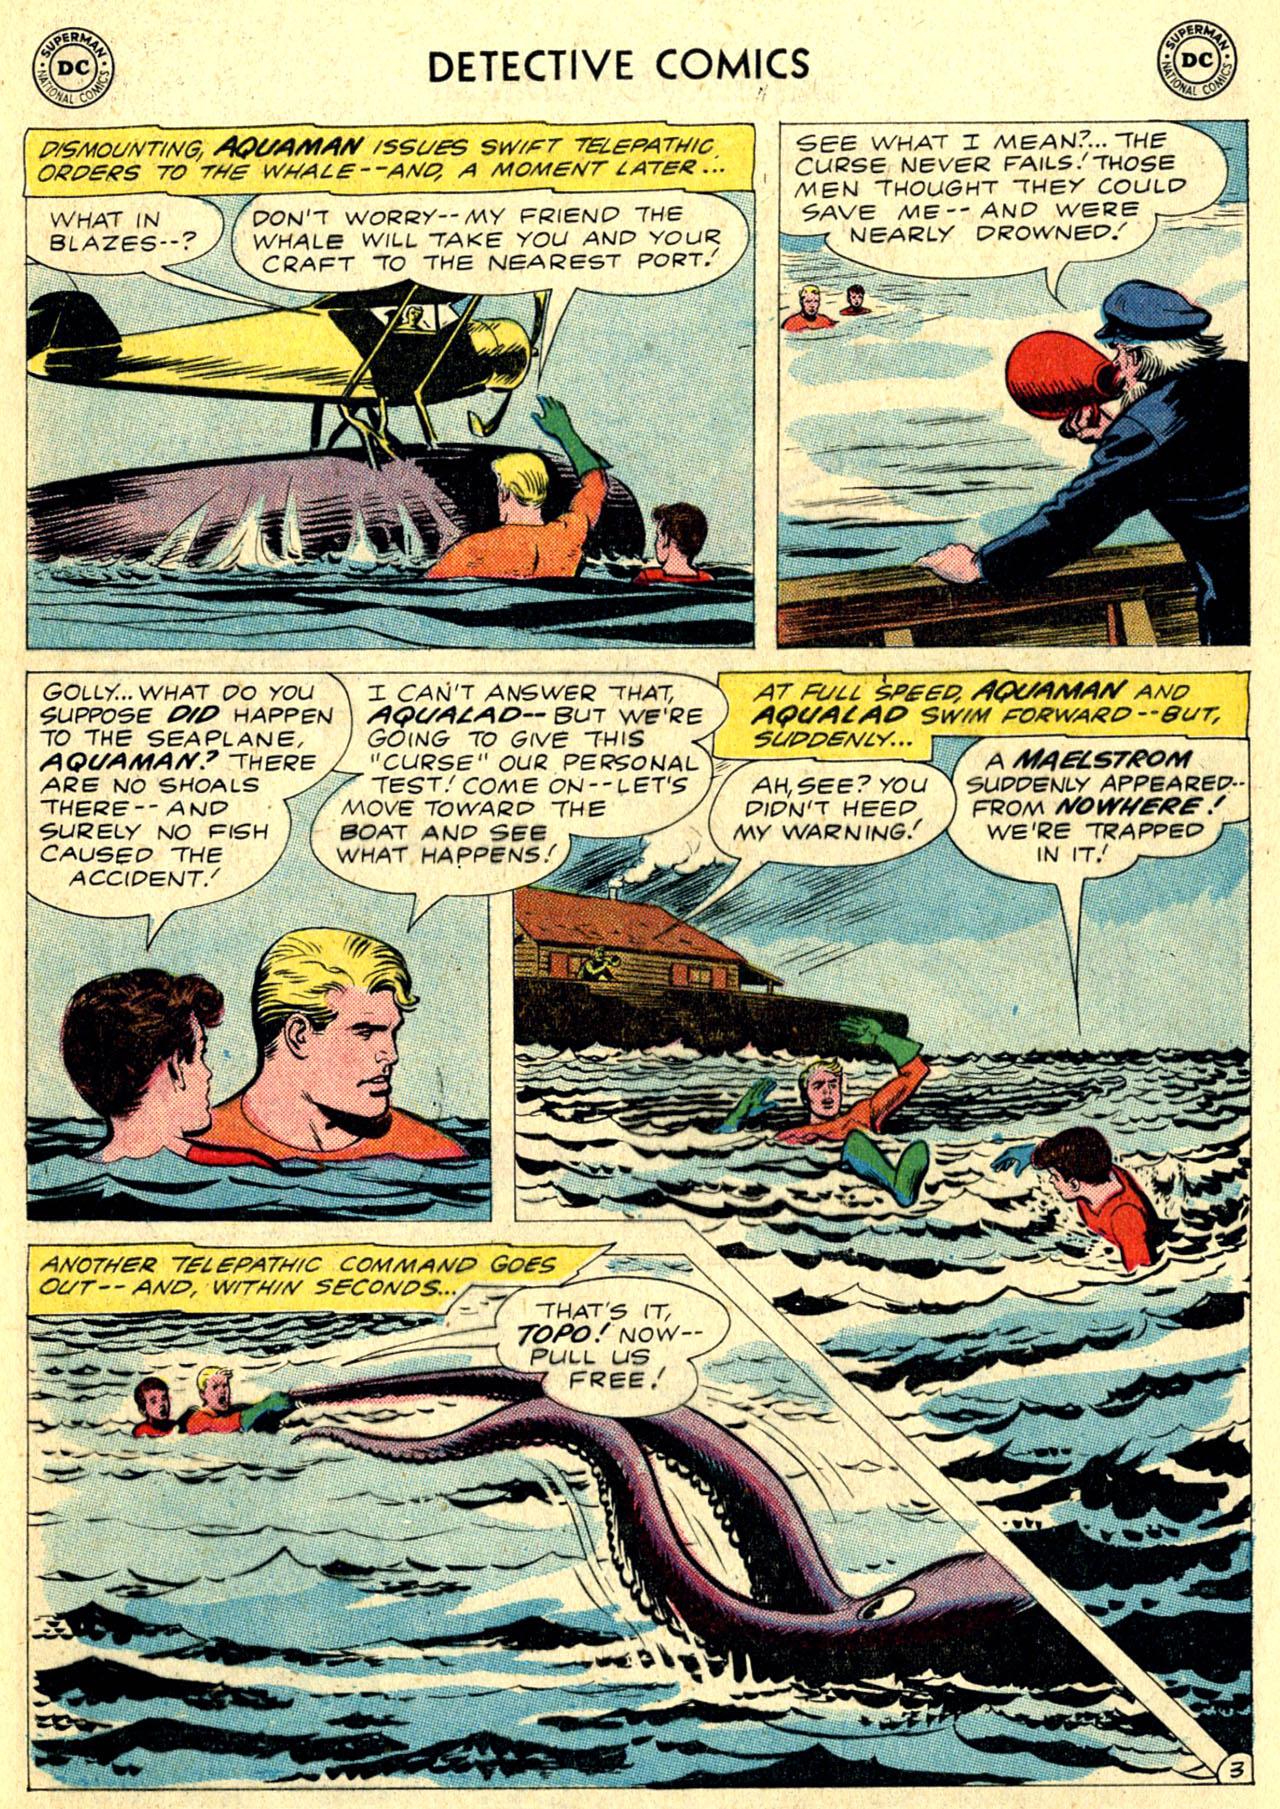 Detective Comics (1937) 295 Page 28